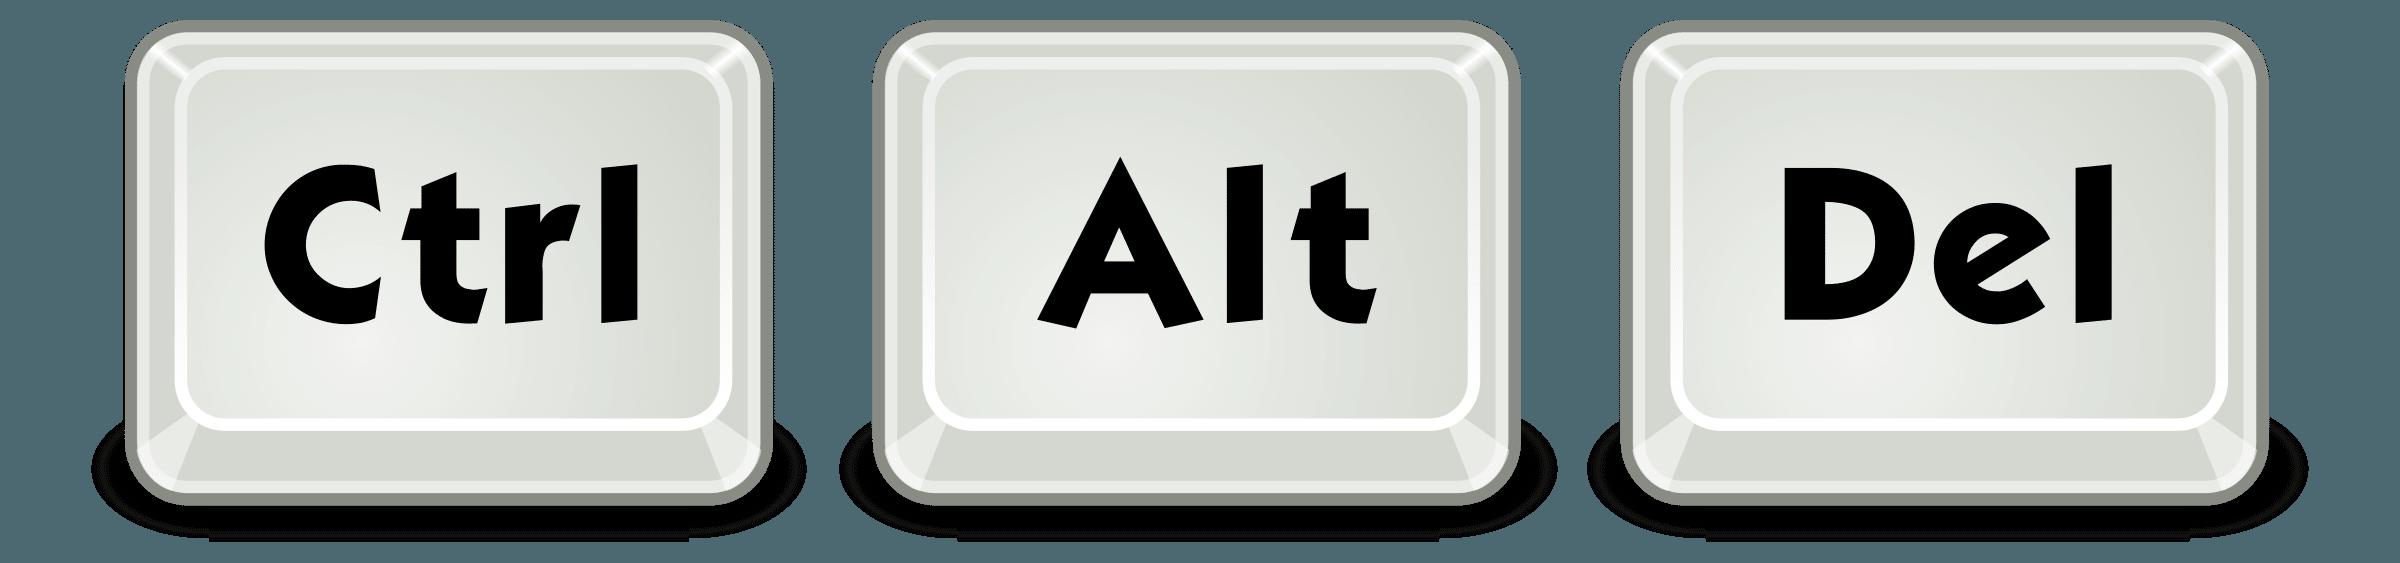 how to do ctrl alt delete from remote desktop